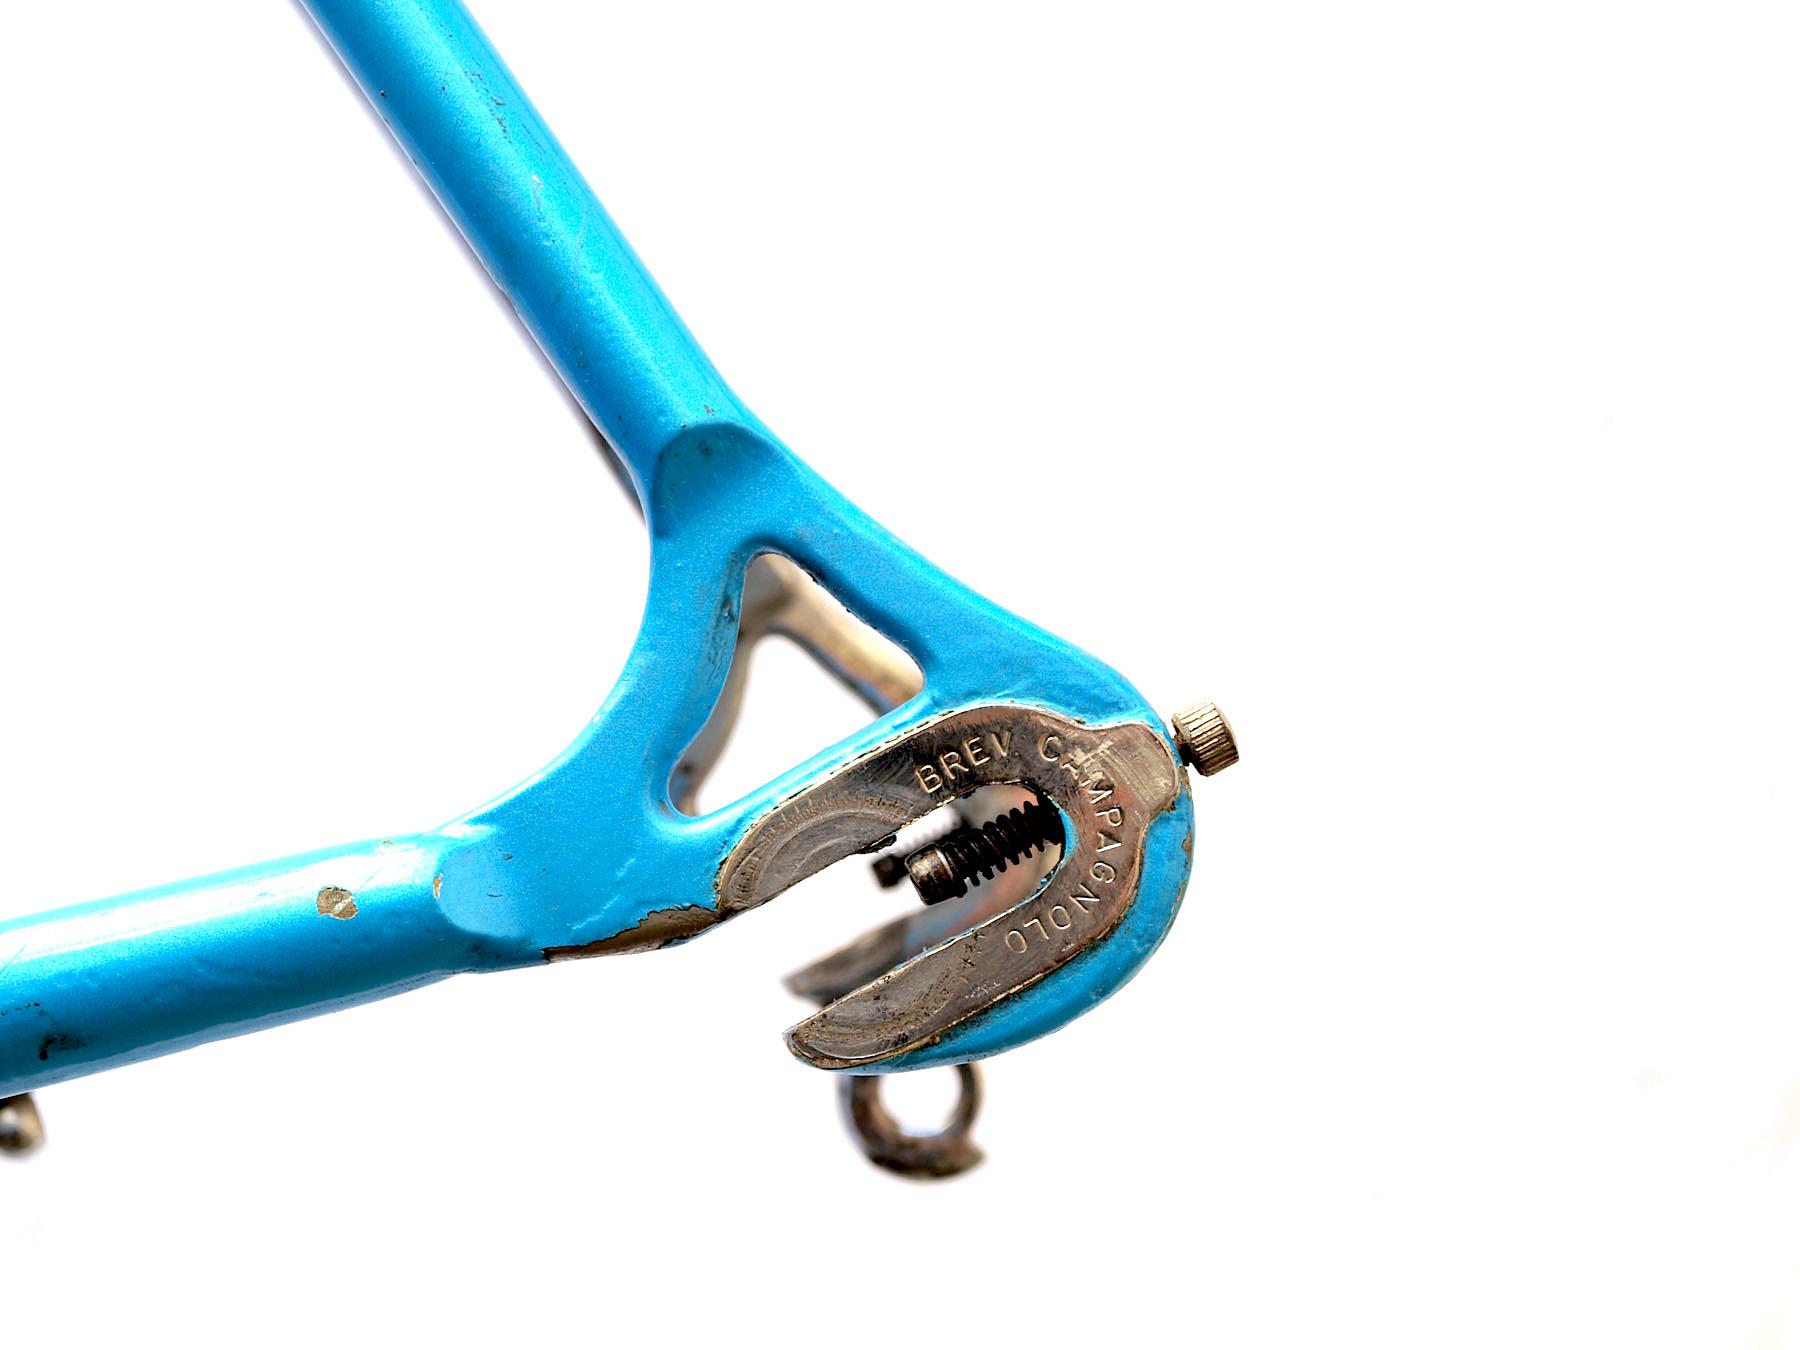 Velovilles | Team Pro 53.5 cm | Vintage Rennrad Teile